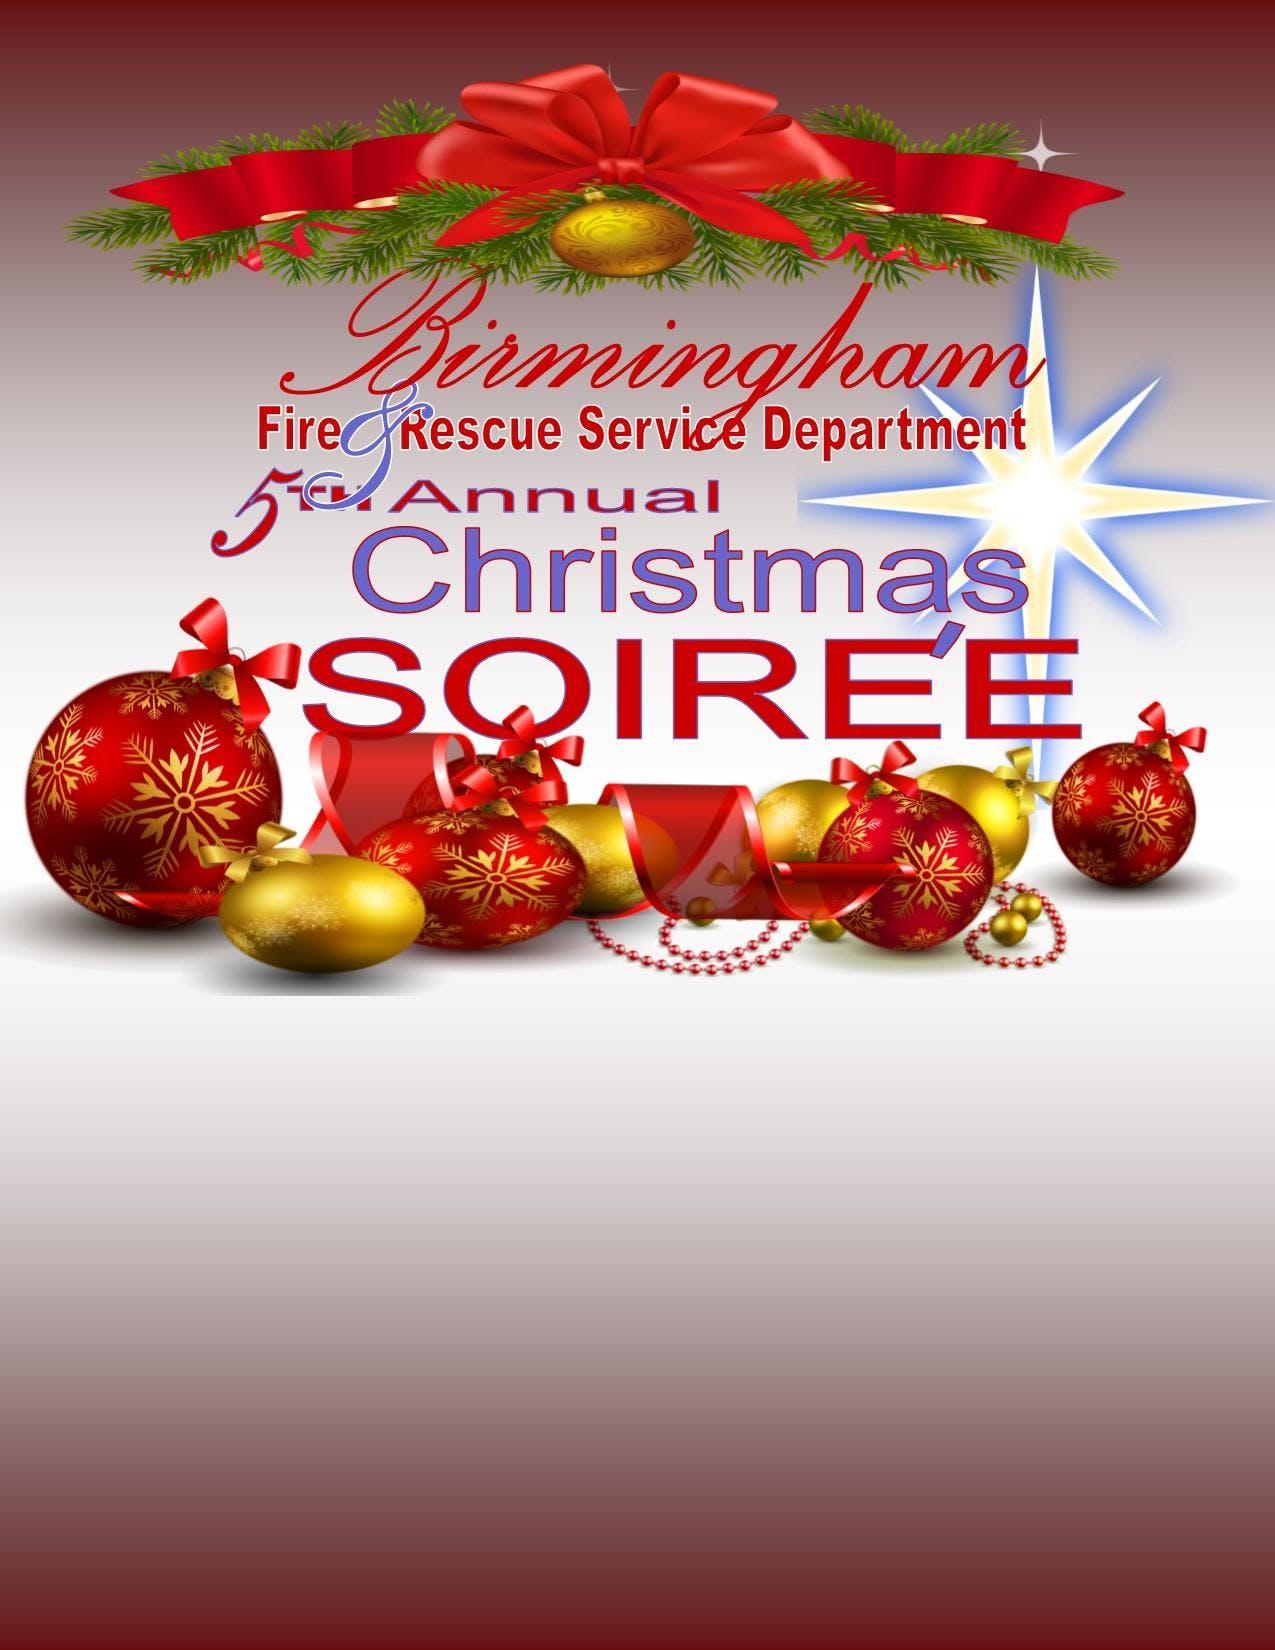 Birmingham Fire & Rescue 5th Annual Christmas